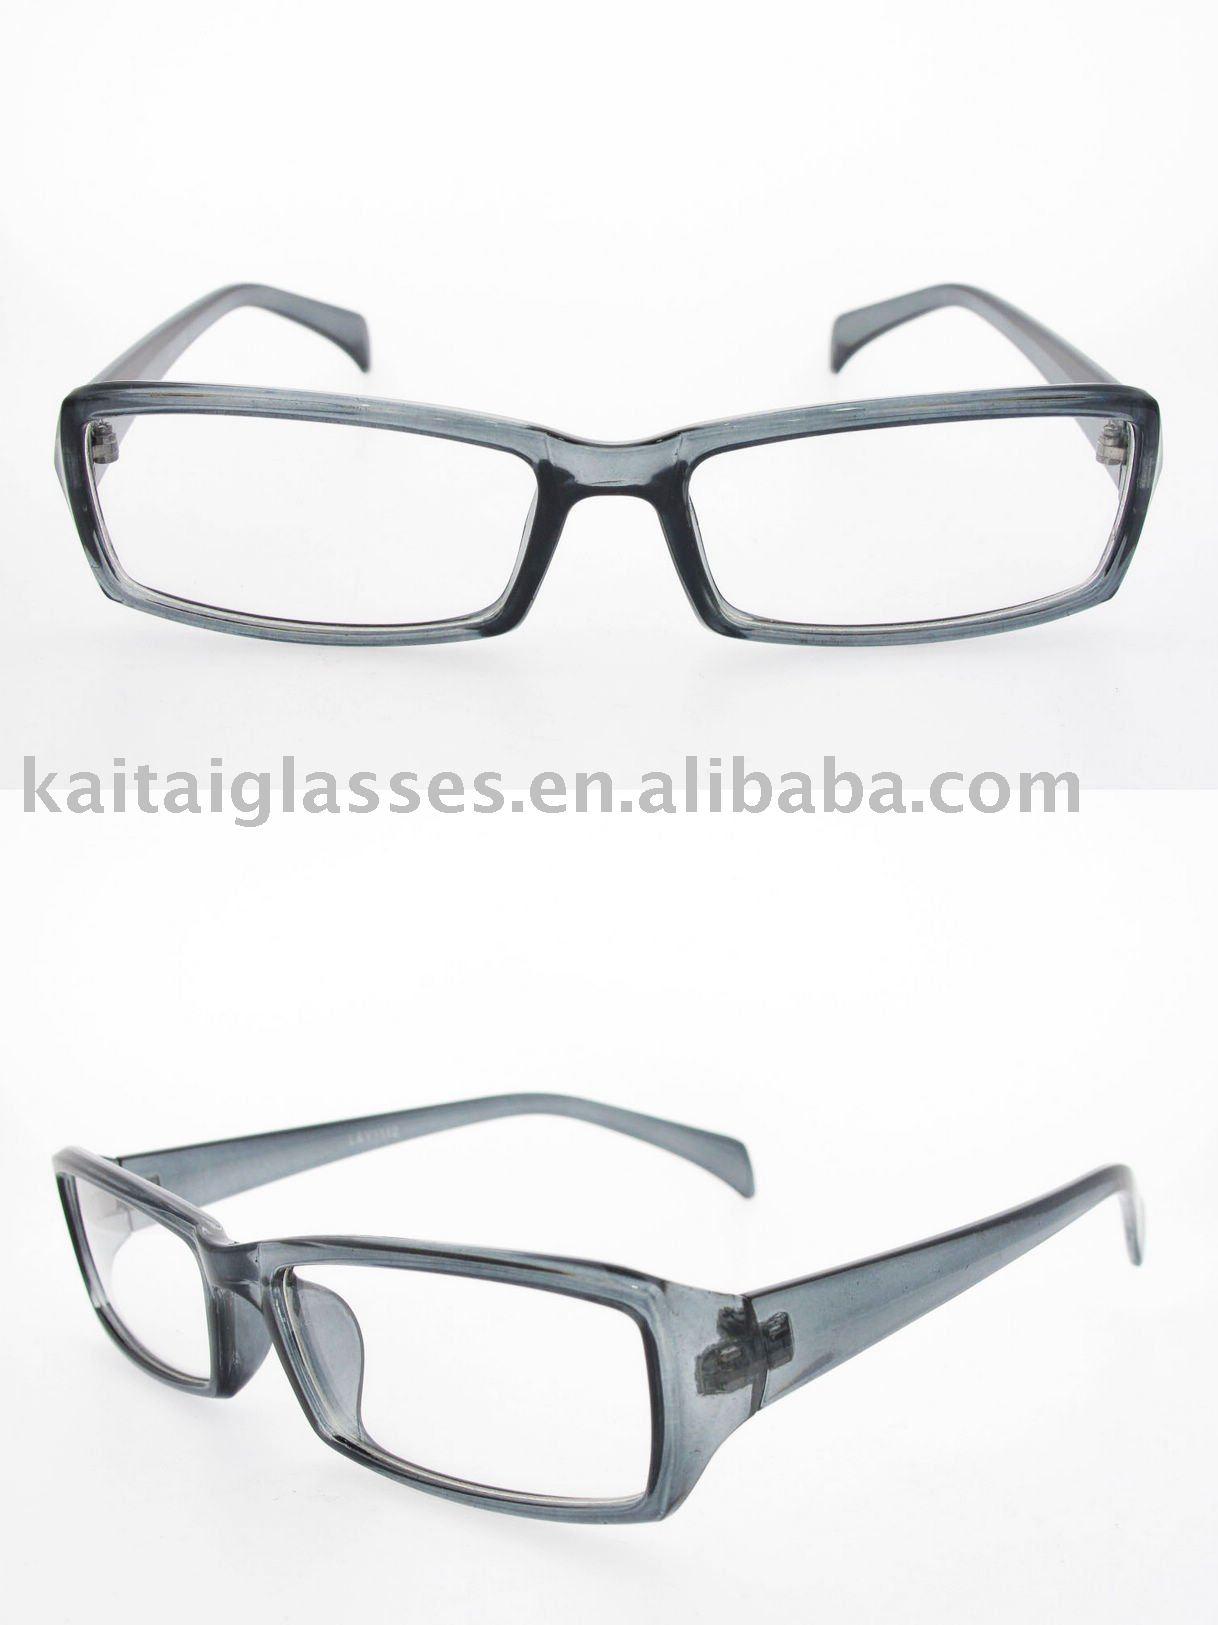 optical frame eyeglasses eyeglasses